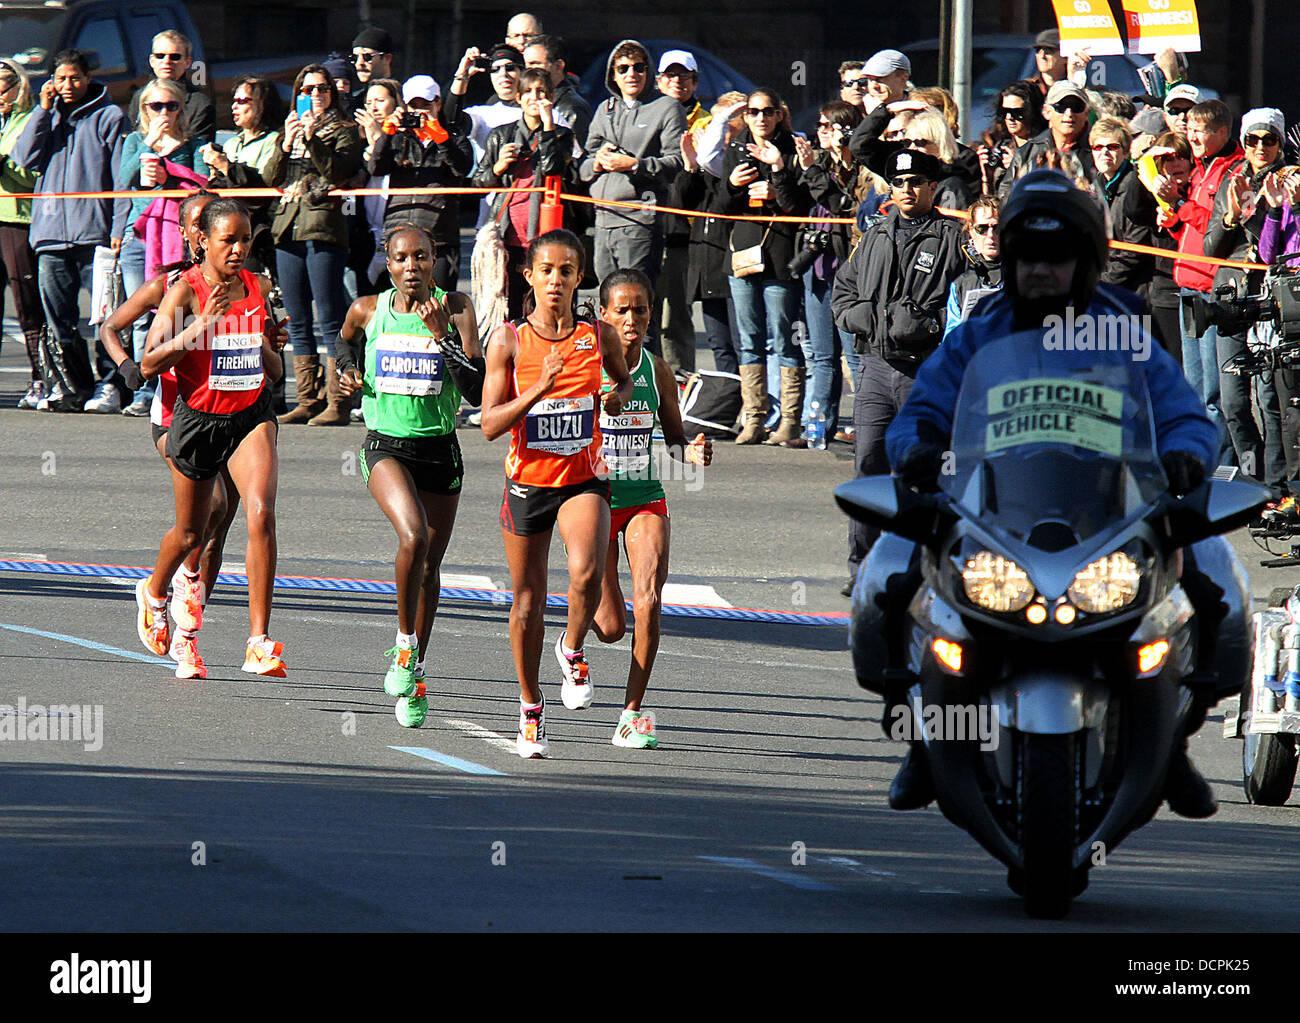 Firehiwot Dado di Etiopia (sinistra), la ING New York City Marathon New York City, Stati Uniti d'America - 06.11.11 Foto Stock